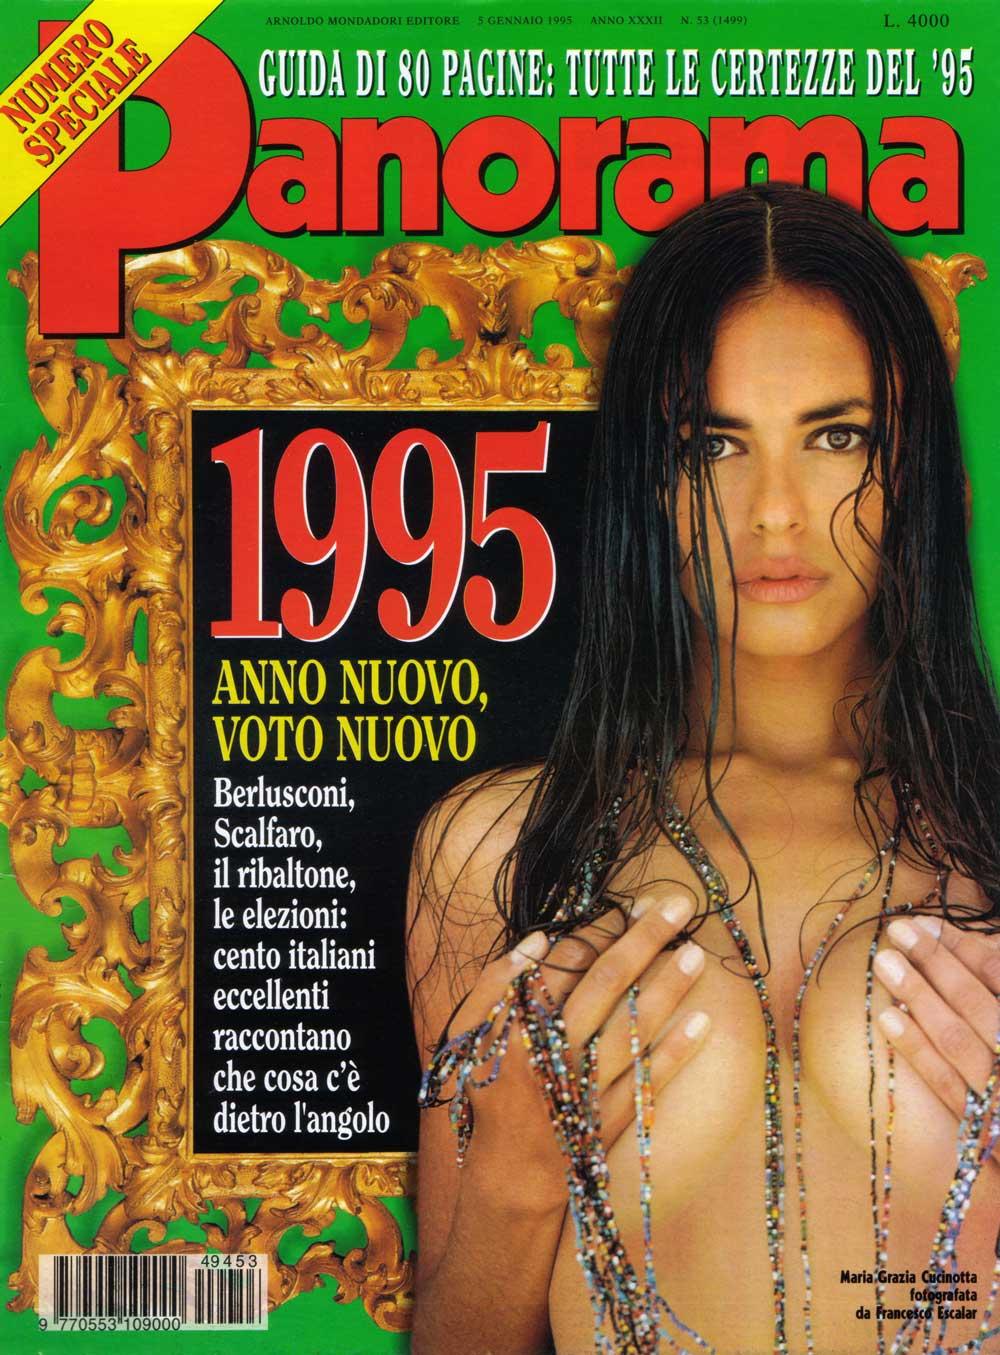 Maria Grazia Cucinotta Calendario.Mariagrazia Cucinotta